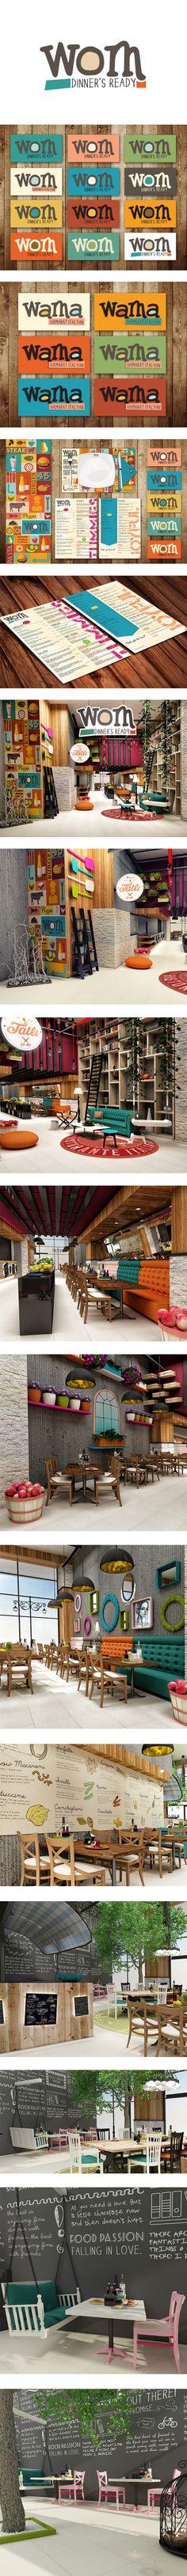 Wom Cafe Restaurant Brand Development & Corporate identity